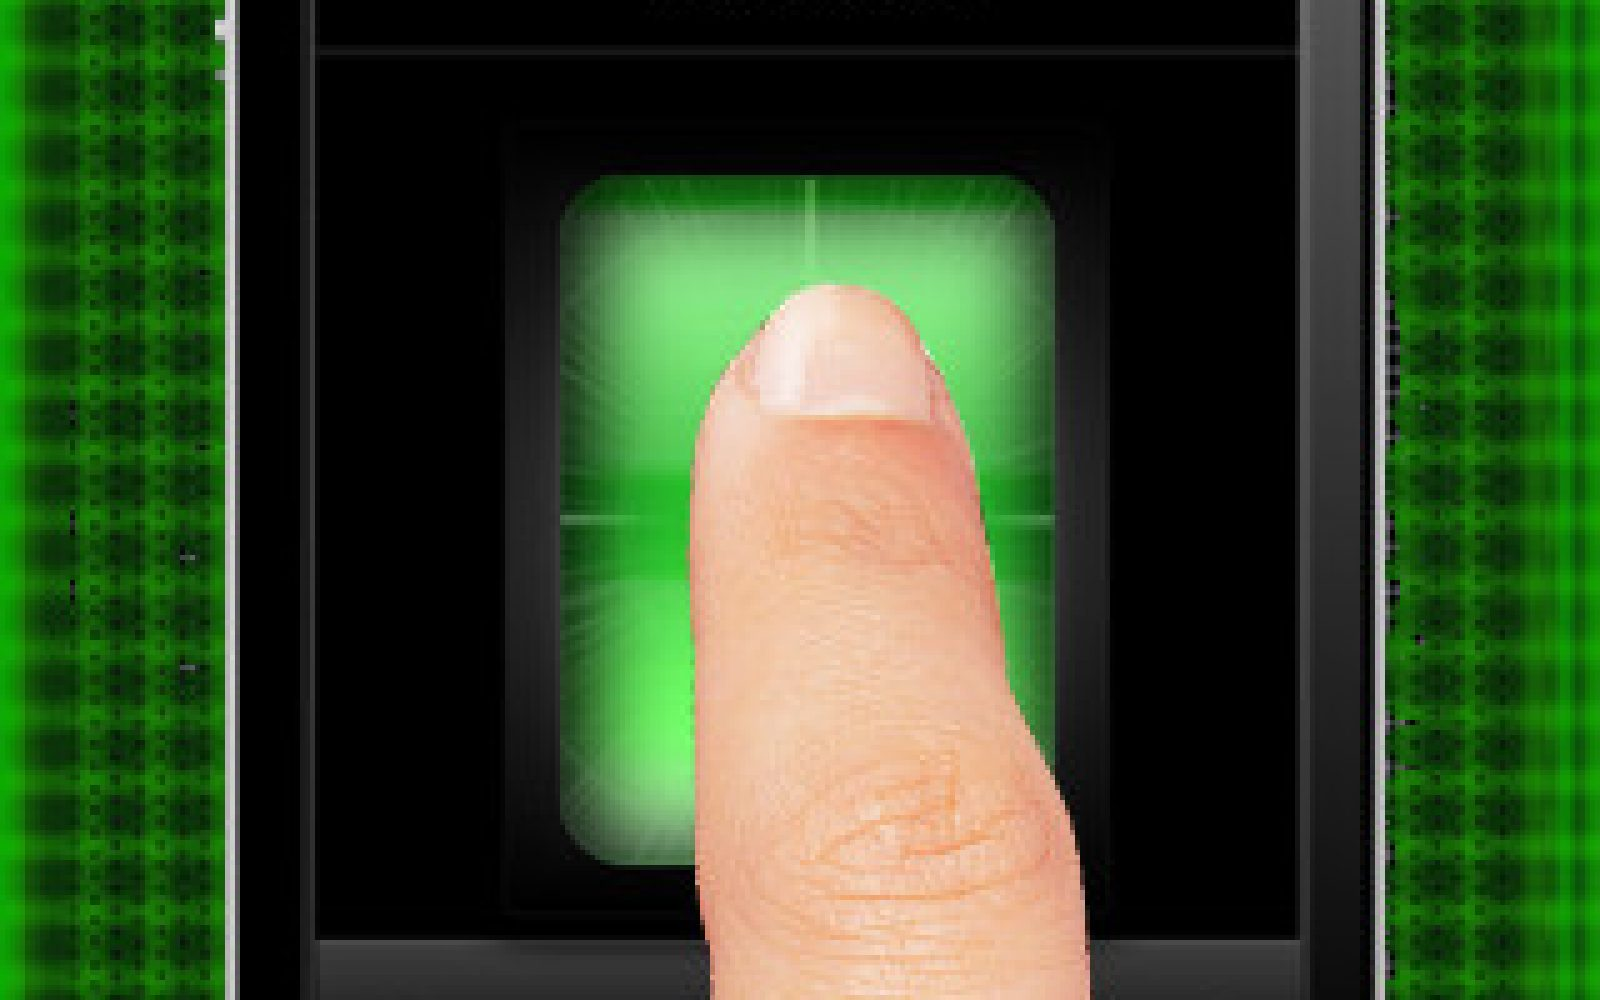 Apple hiring software engineers to work on fingerprint tech at Authentec's Melbourne Design Center?